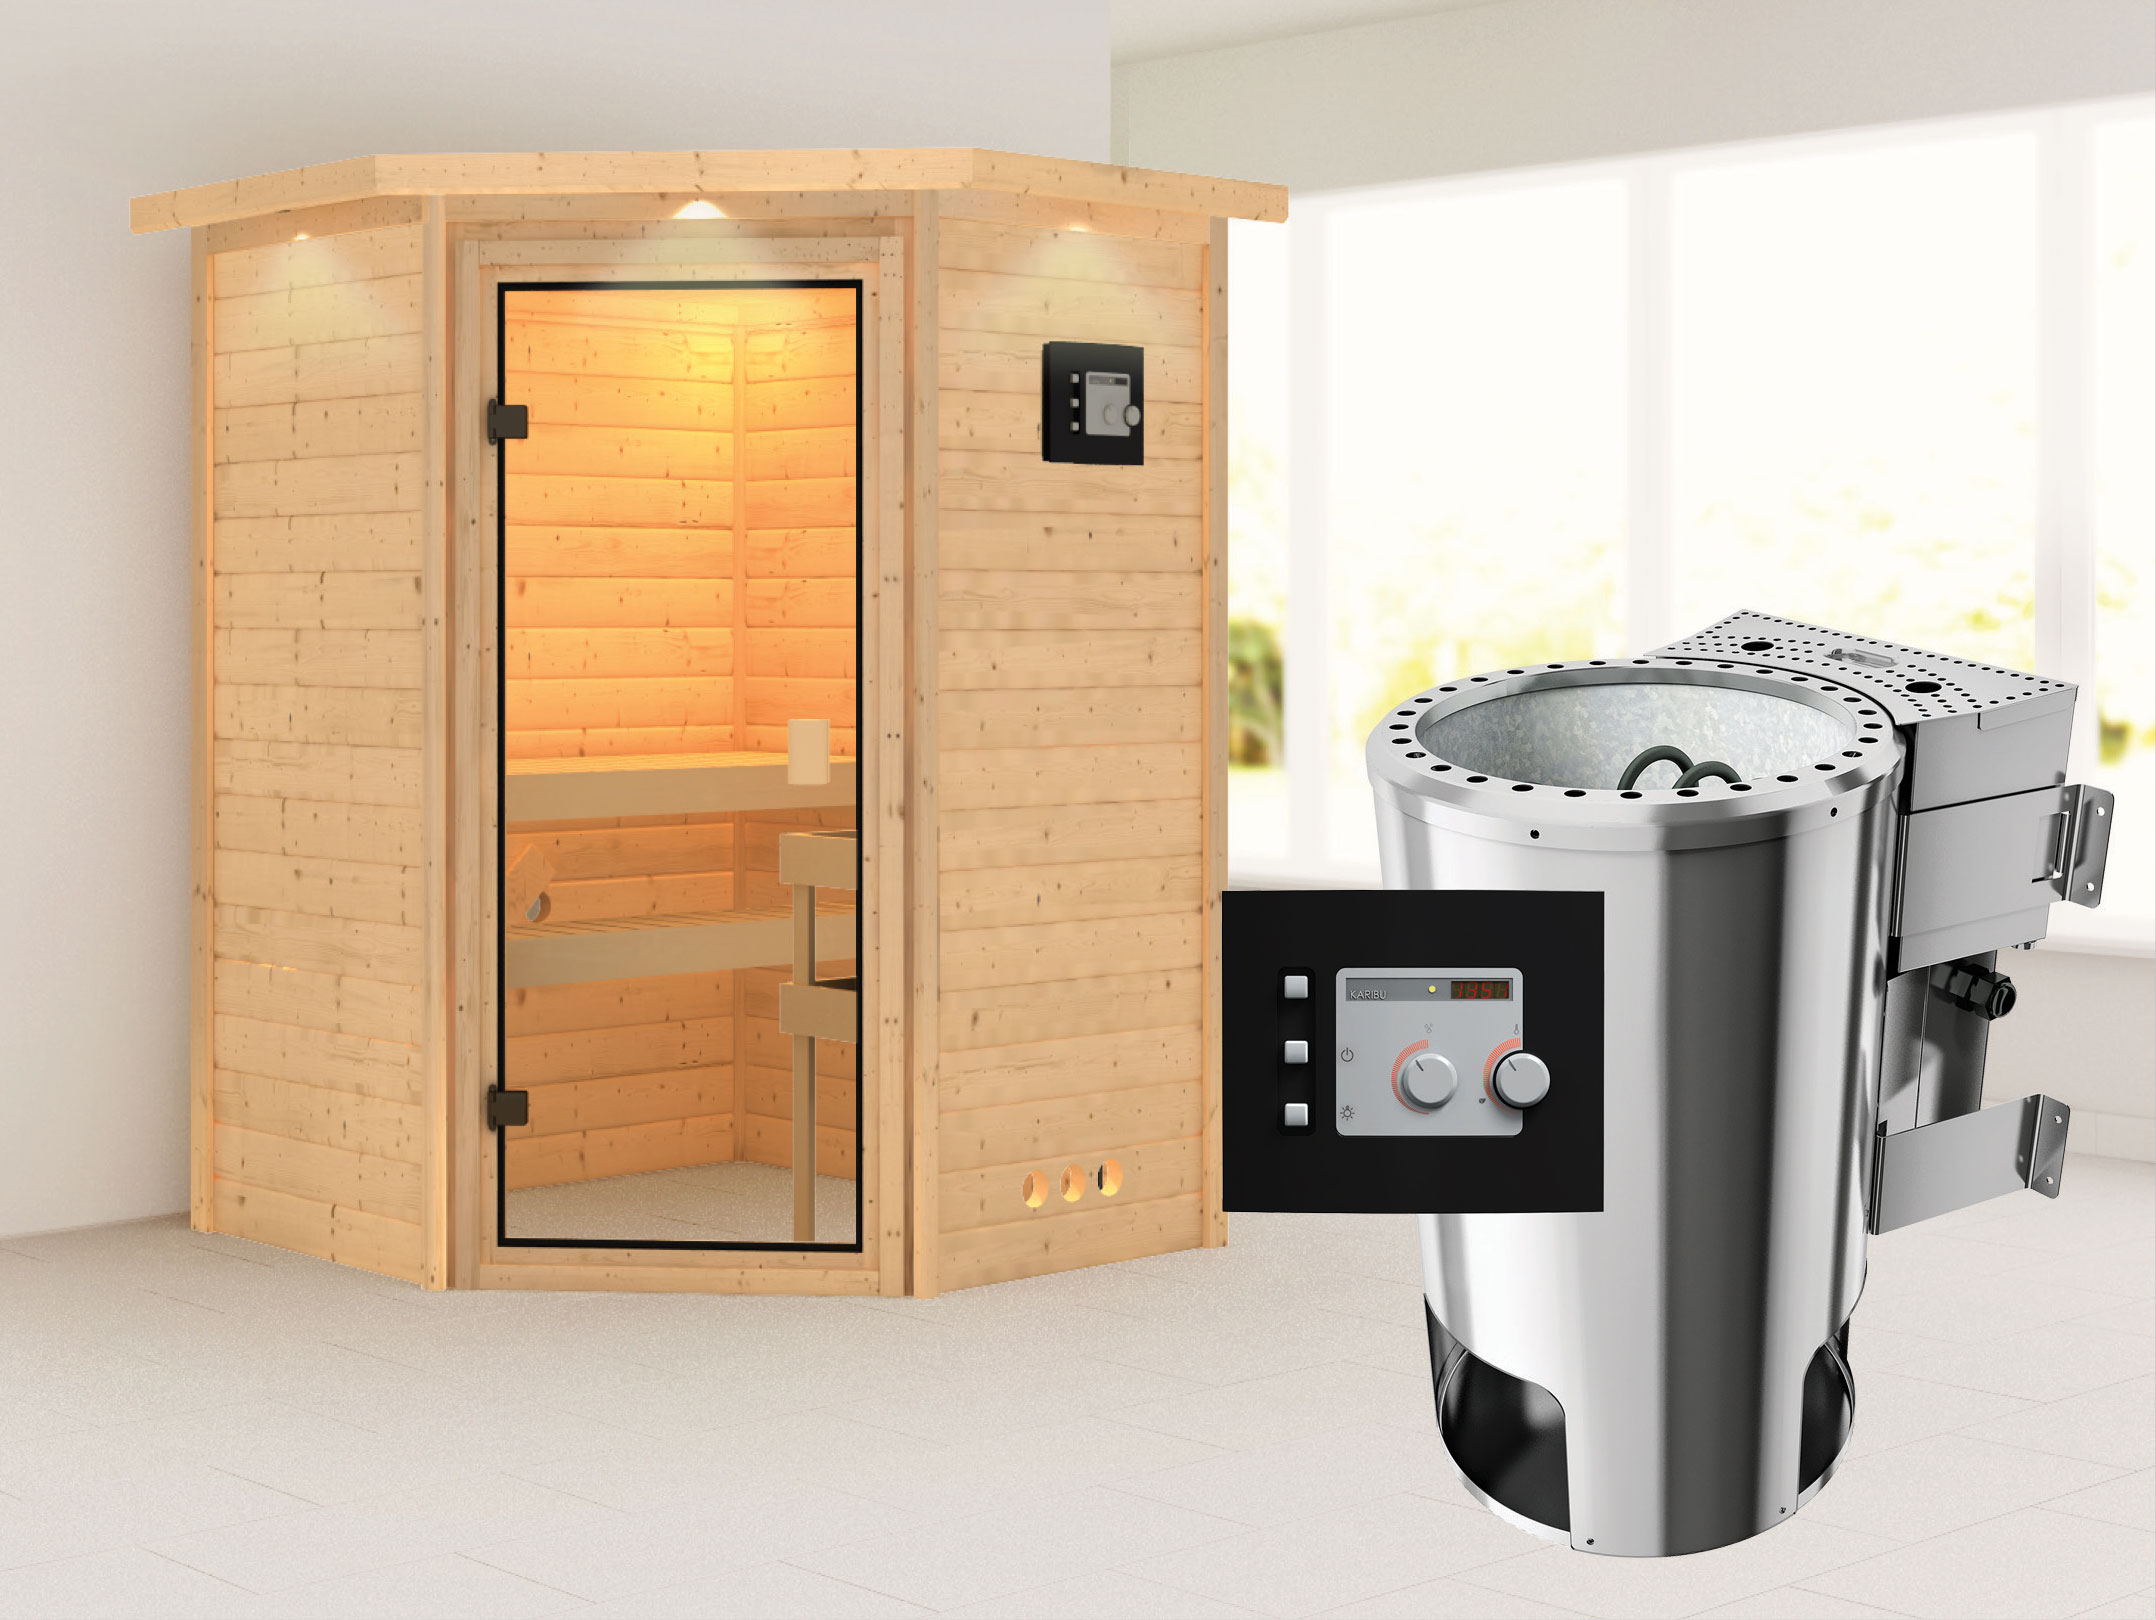 karibu sauna alicja 38mm 230v dachkranz bio ofen 3 6kw classic t r bei. Black Bedroom Furniture Sets. Home Design Ideas